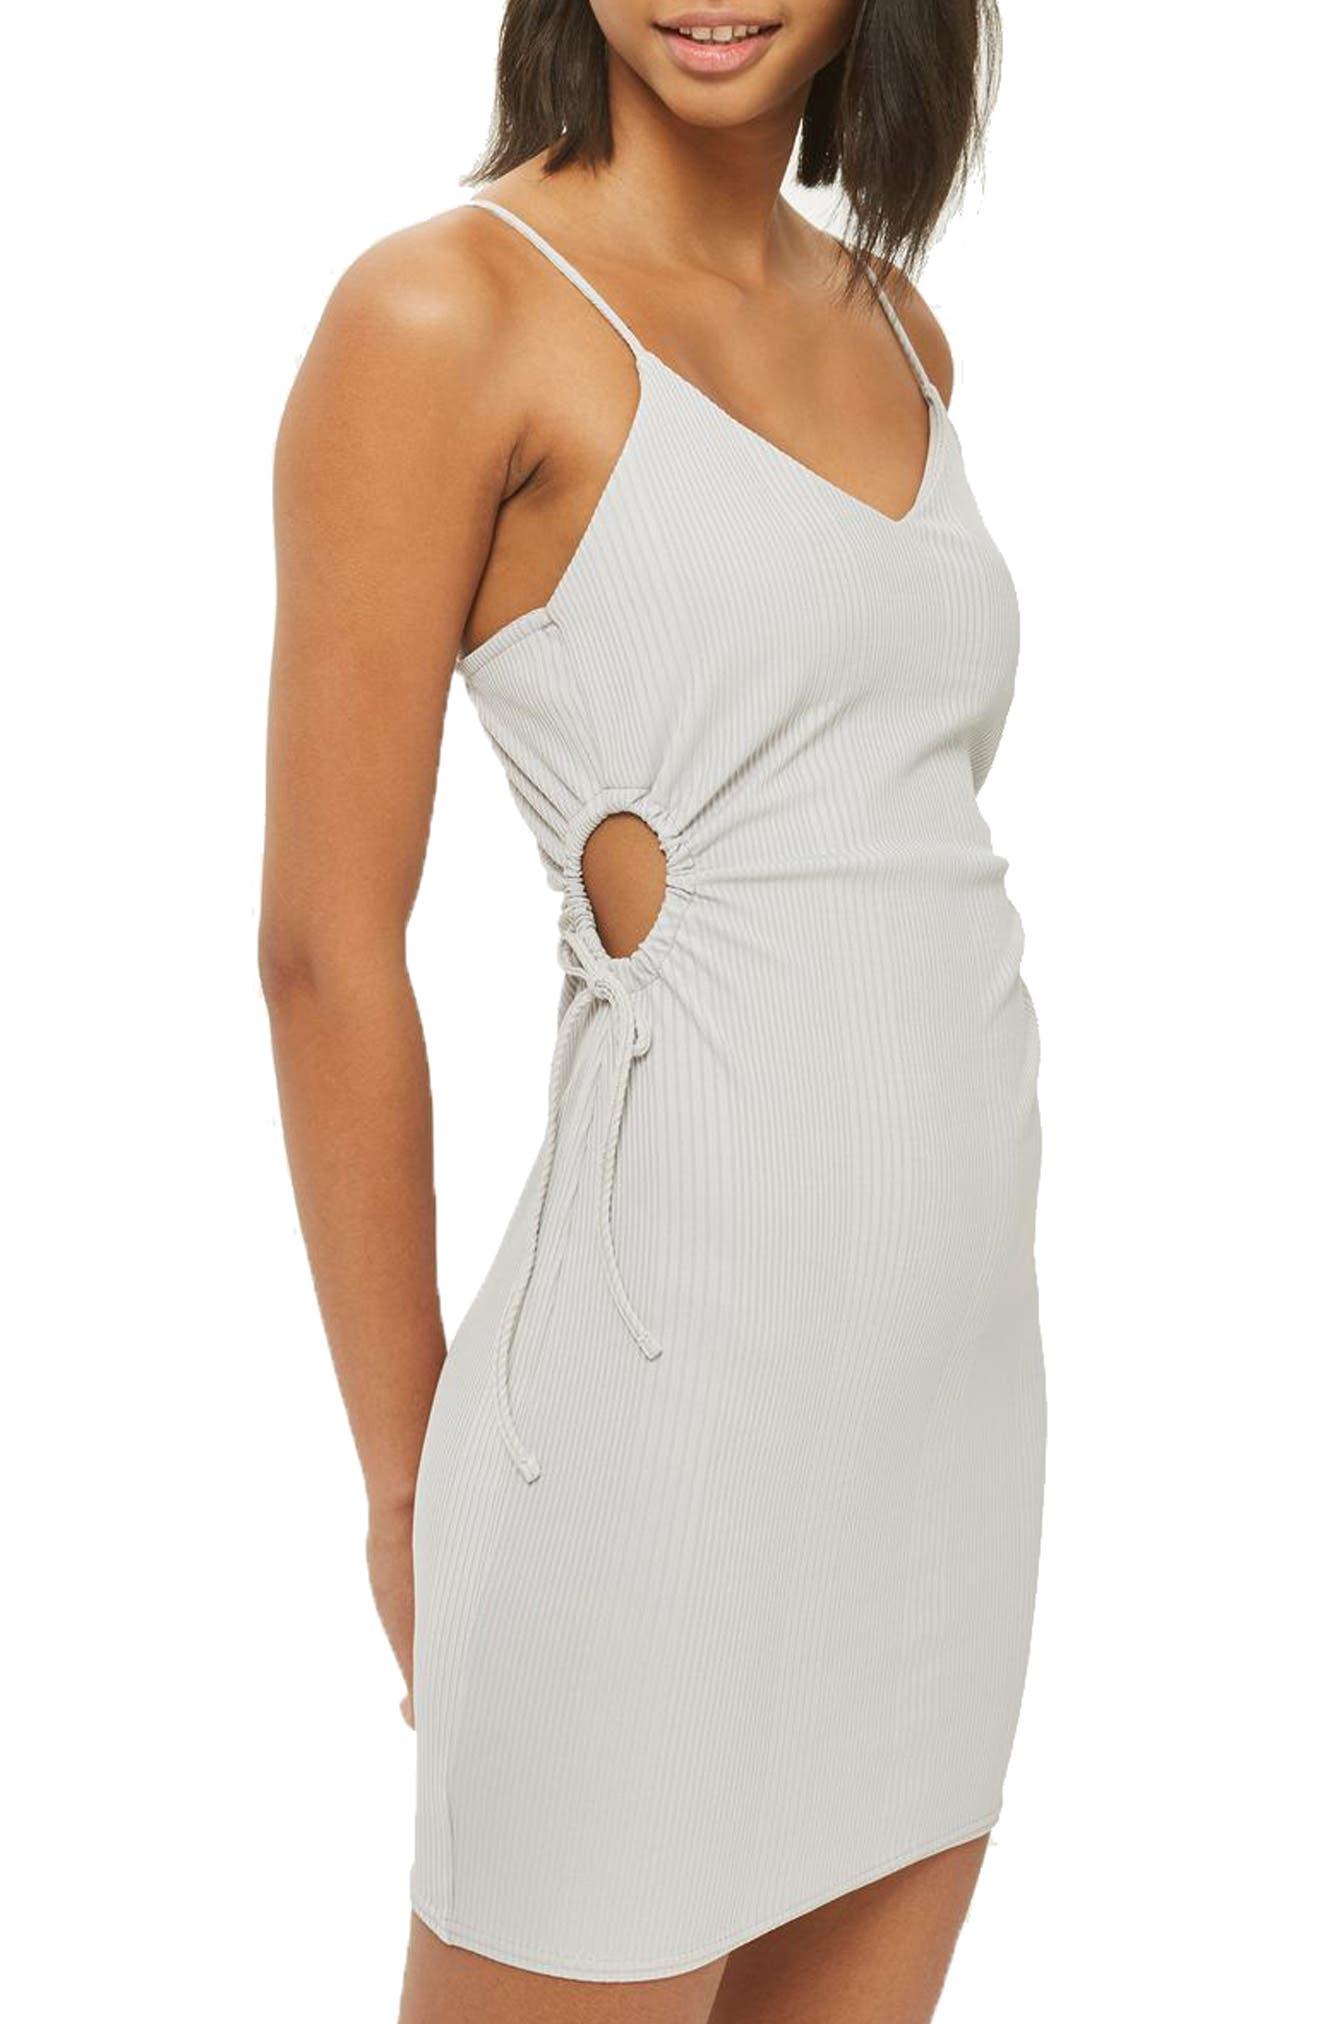 Topshop Drawstring Cutout Body-Con Dress